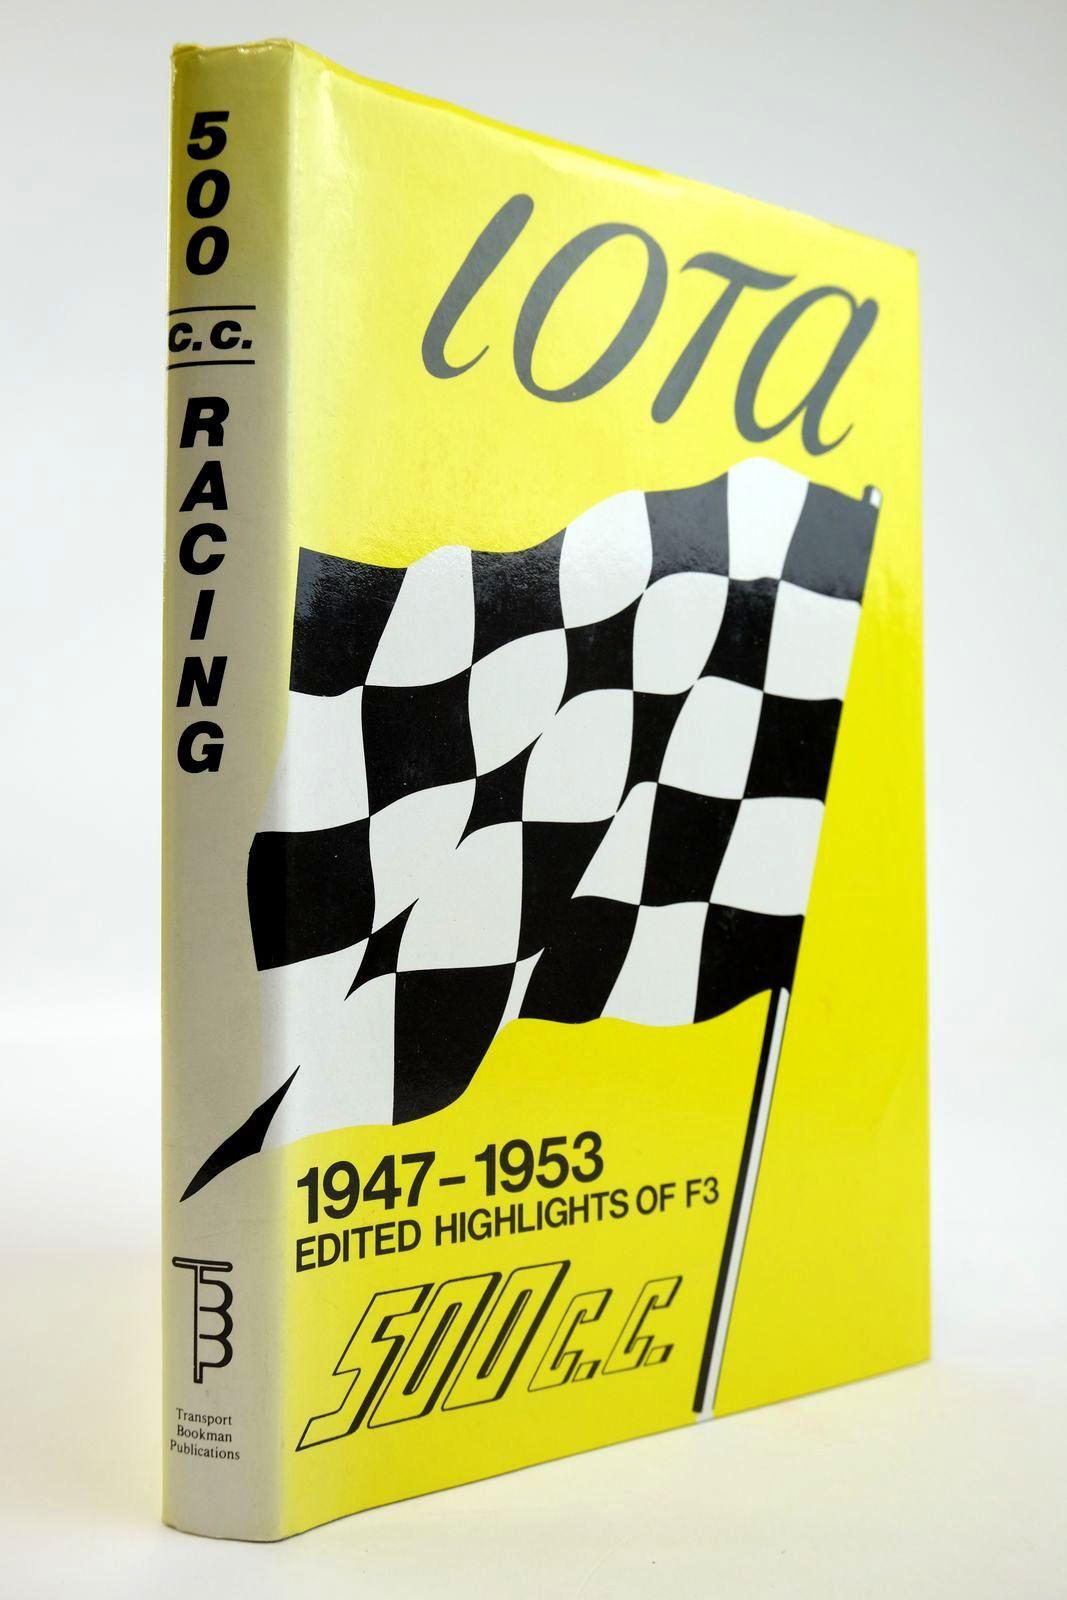 Photo of IOTA 1947-1953